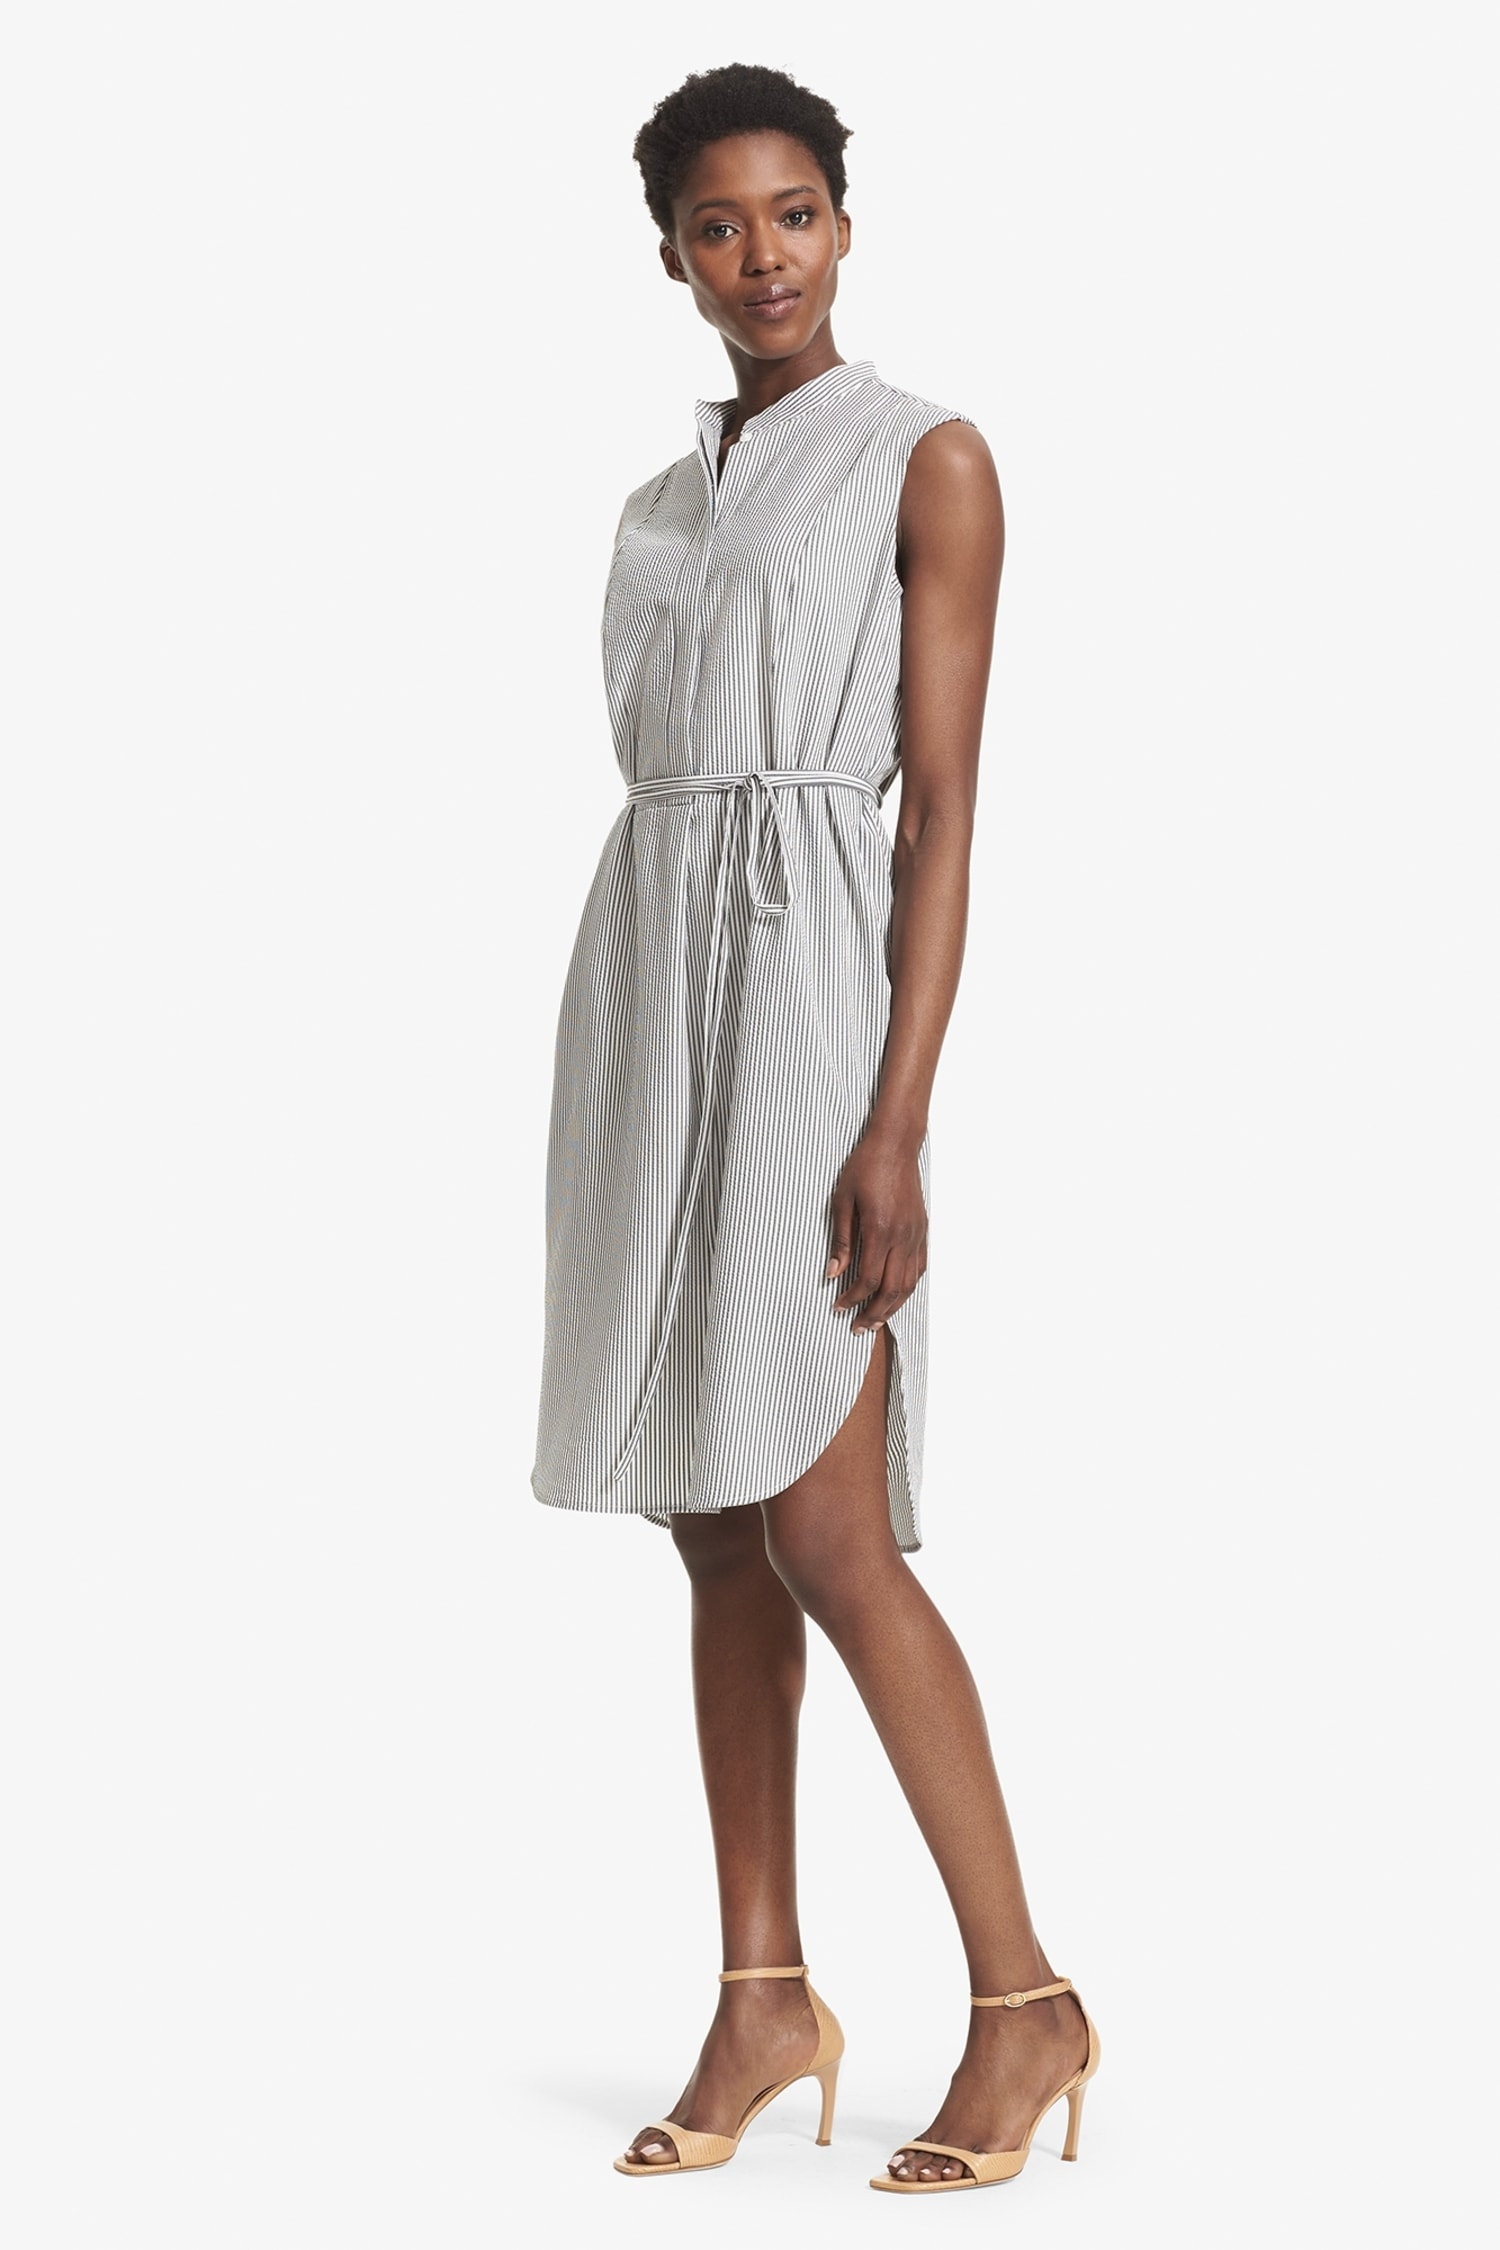 The Gigi Dress—Seersucker